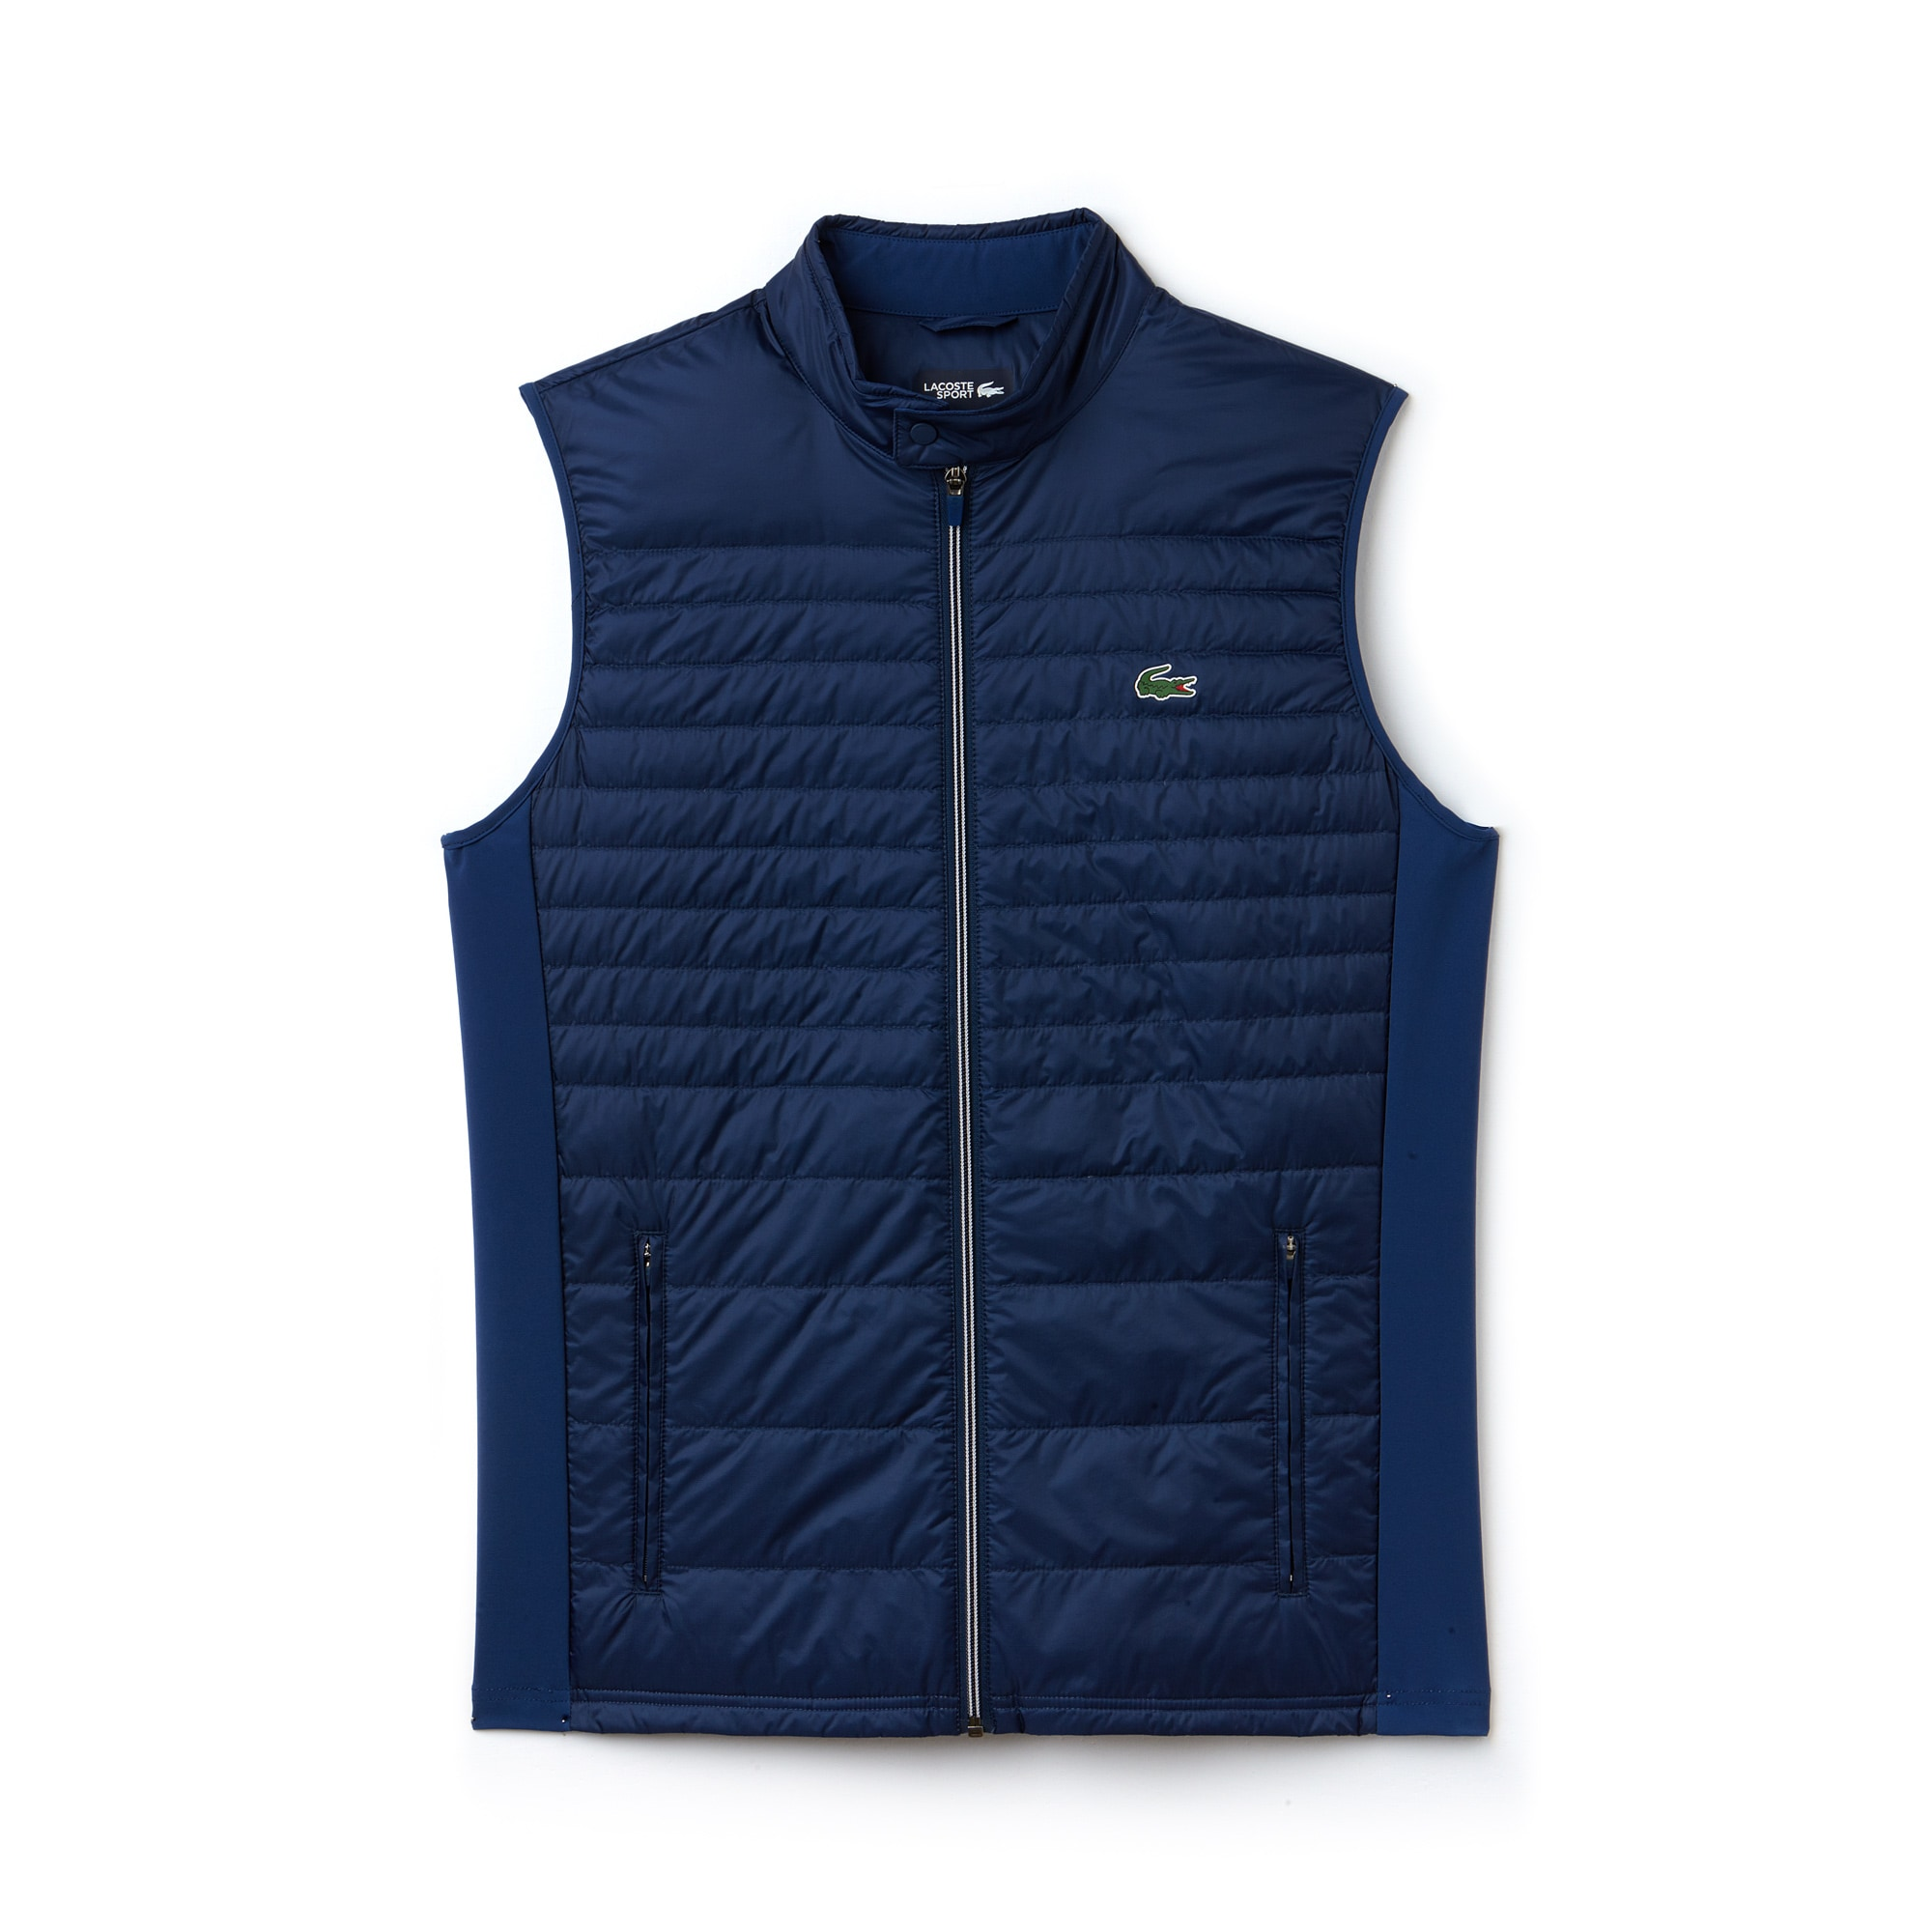 Men's SPORT Water-Resistant Quilted Technical Golf Vest